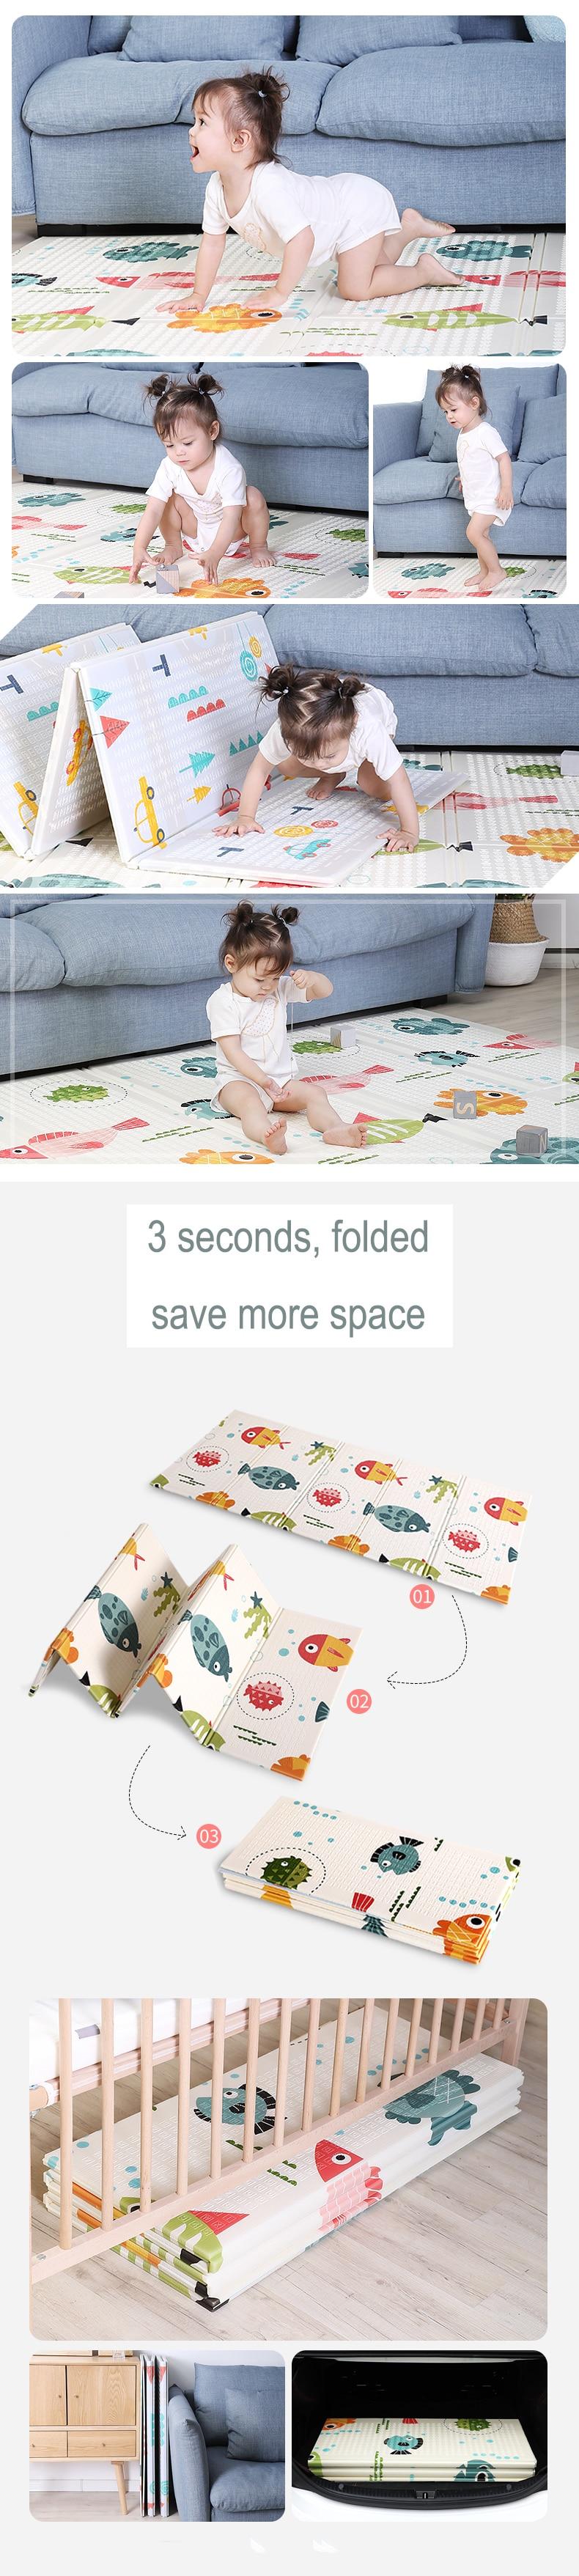 H007d6cf669fd4af882657220e32c4d73N 200*180cm  Foldable Cartoon Baby Play Mat Xpe Puzzle Children's Mat Baby Climbing Pad Kids Rug Baby Games Mats